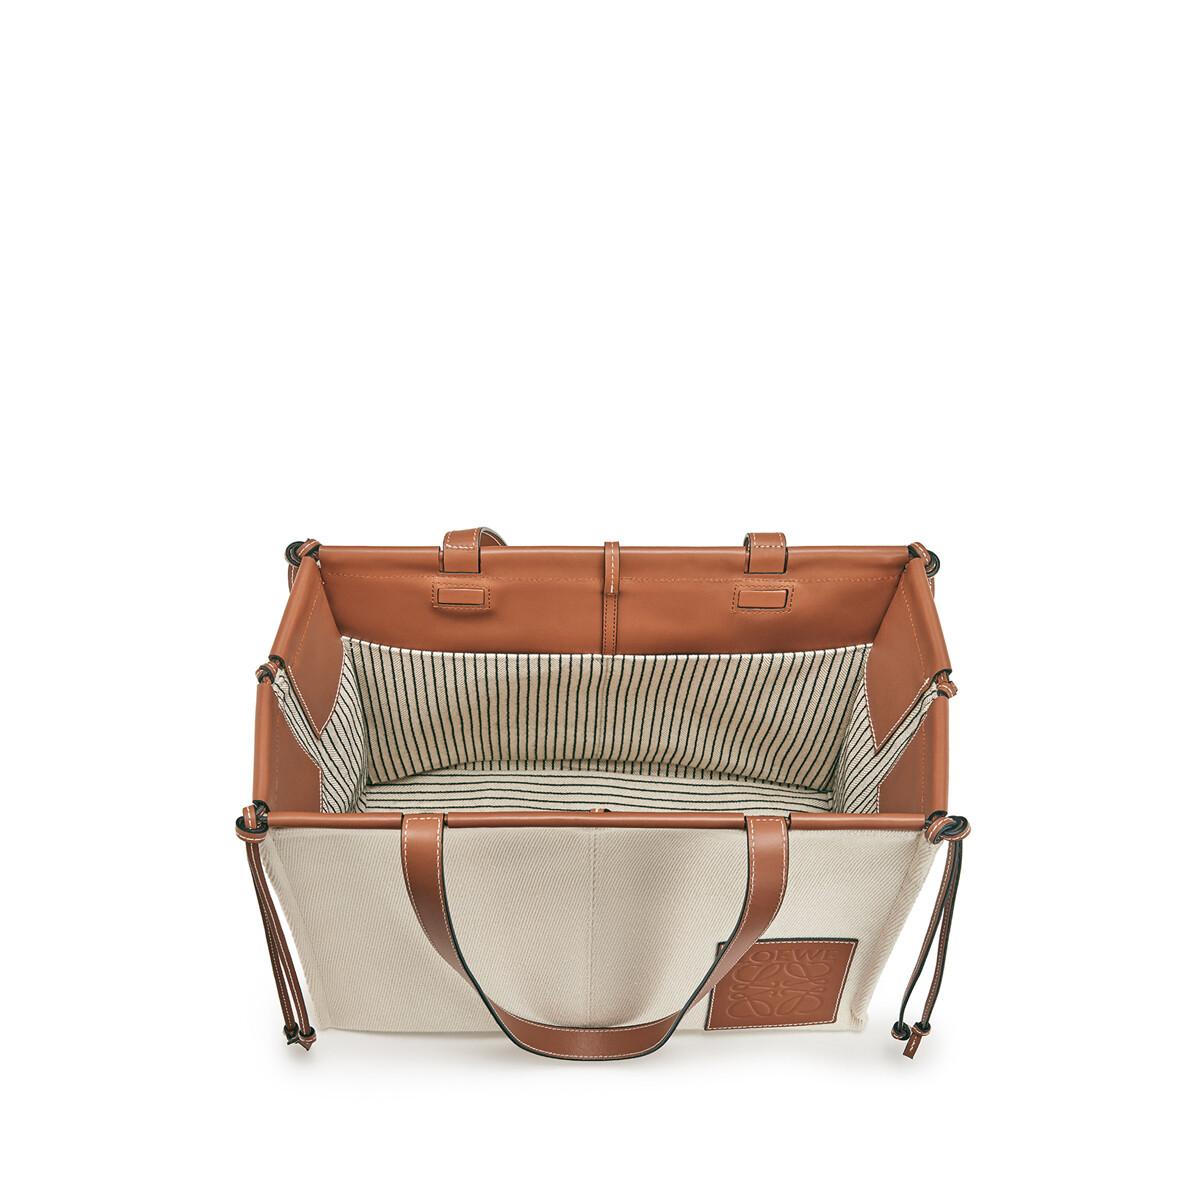 LOEWE Bolso Cushion Tote Pequeño Avena Claro front